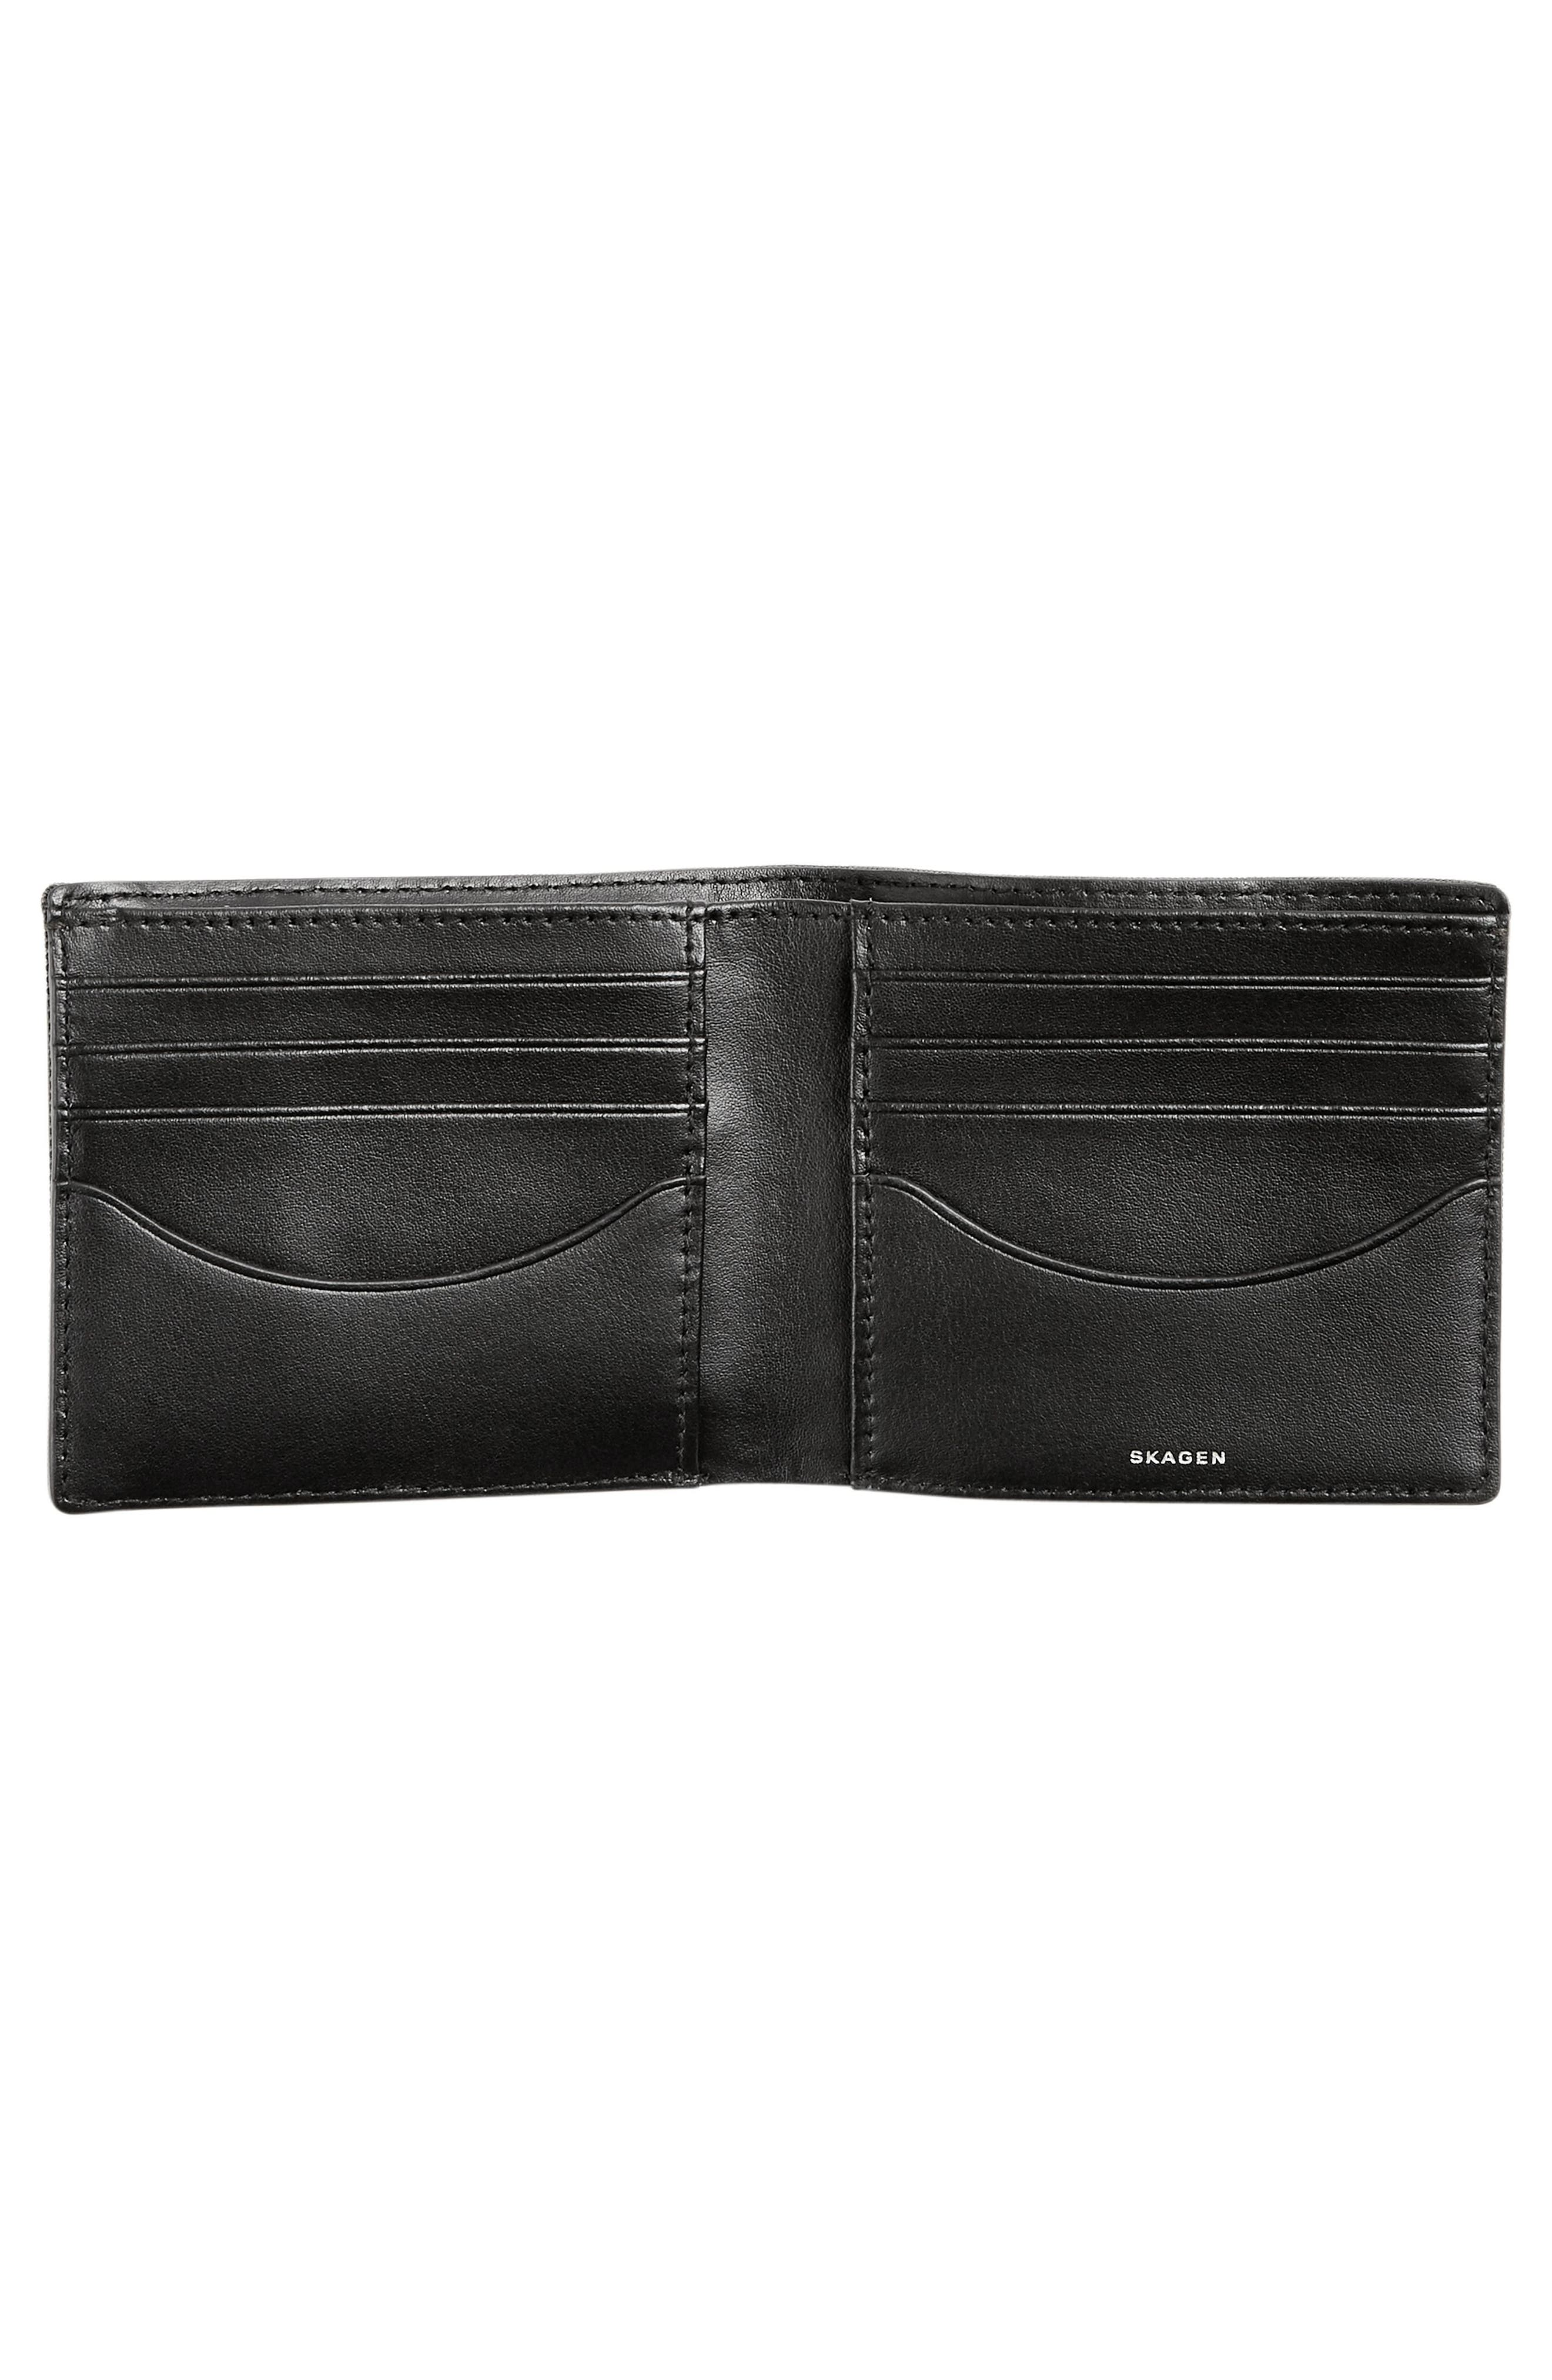 Passcase Wallet,                             Alternate thumbnail 2, color,                             Dark Green